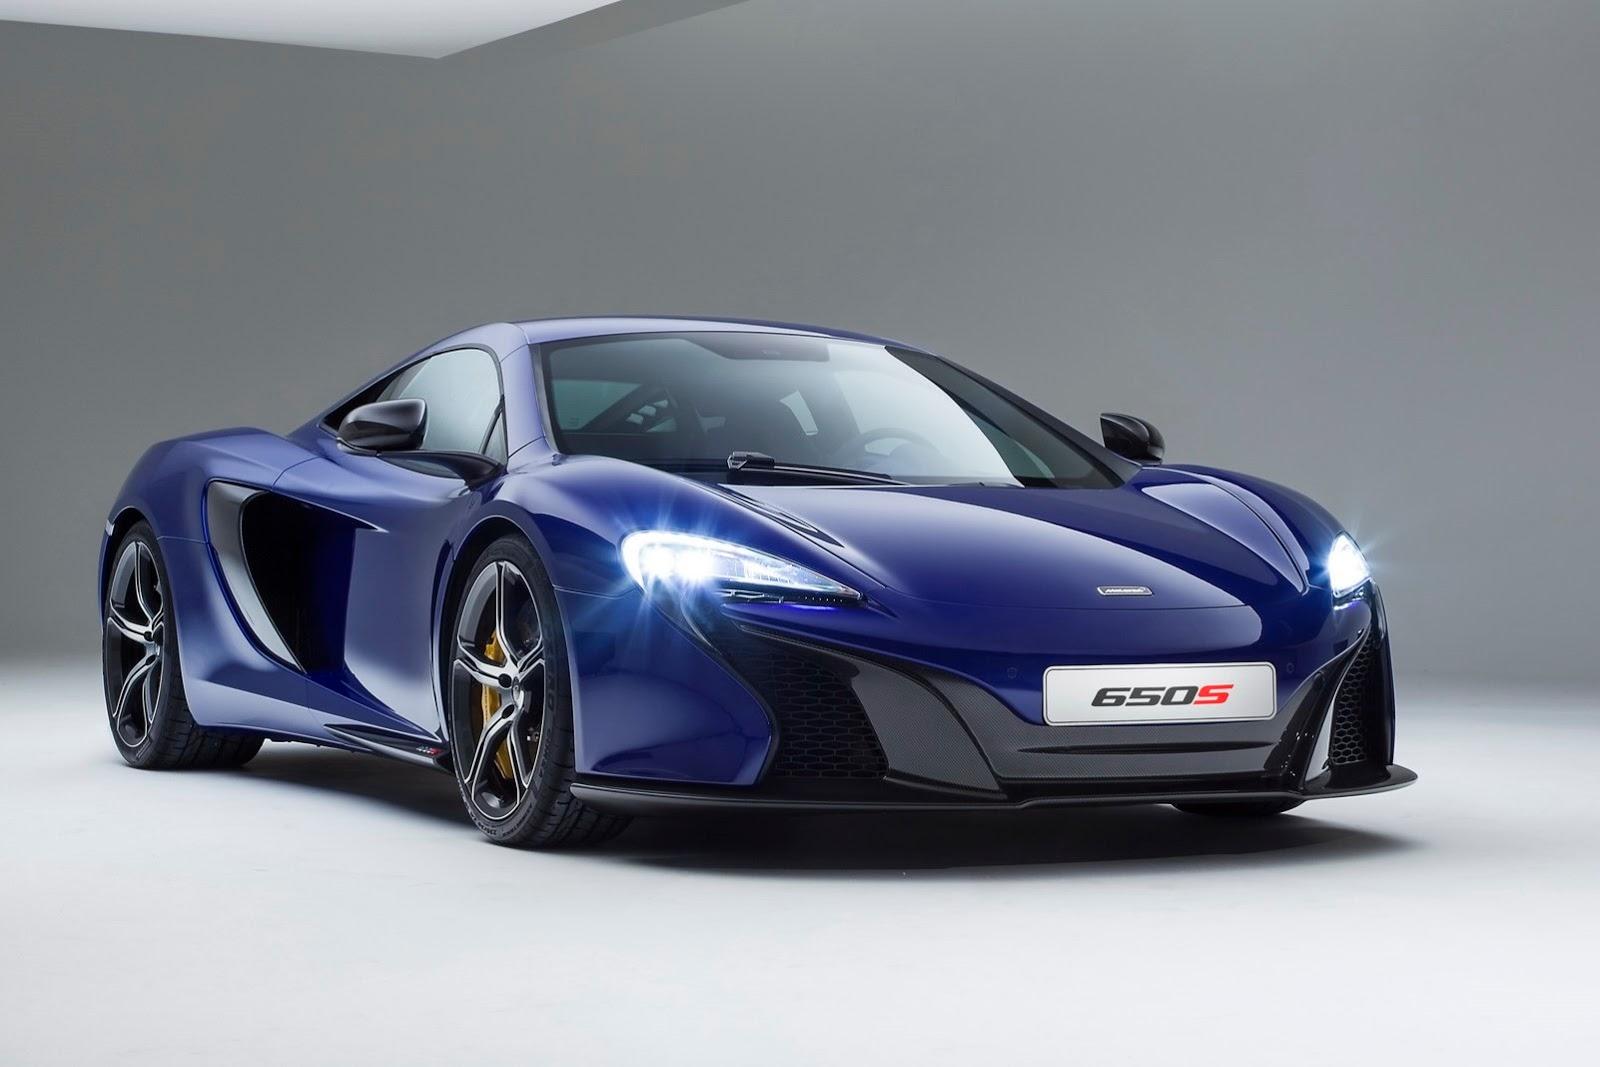 http://lh6.ggpht.com/-FgZj3JHmVOA/UwIM4C3rGCI/AAAAAAAQIJY/jypL6JLXBLY/s1600/McLaren-650S-1%25255B2%25255D.jpg